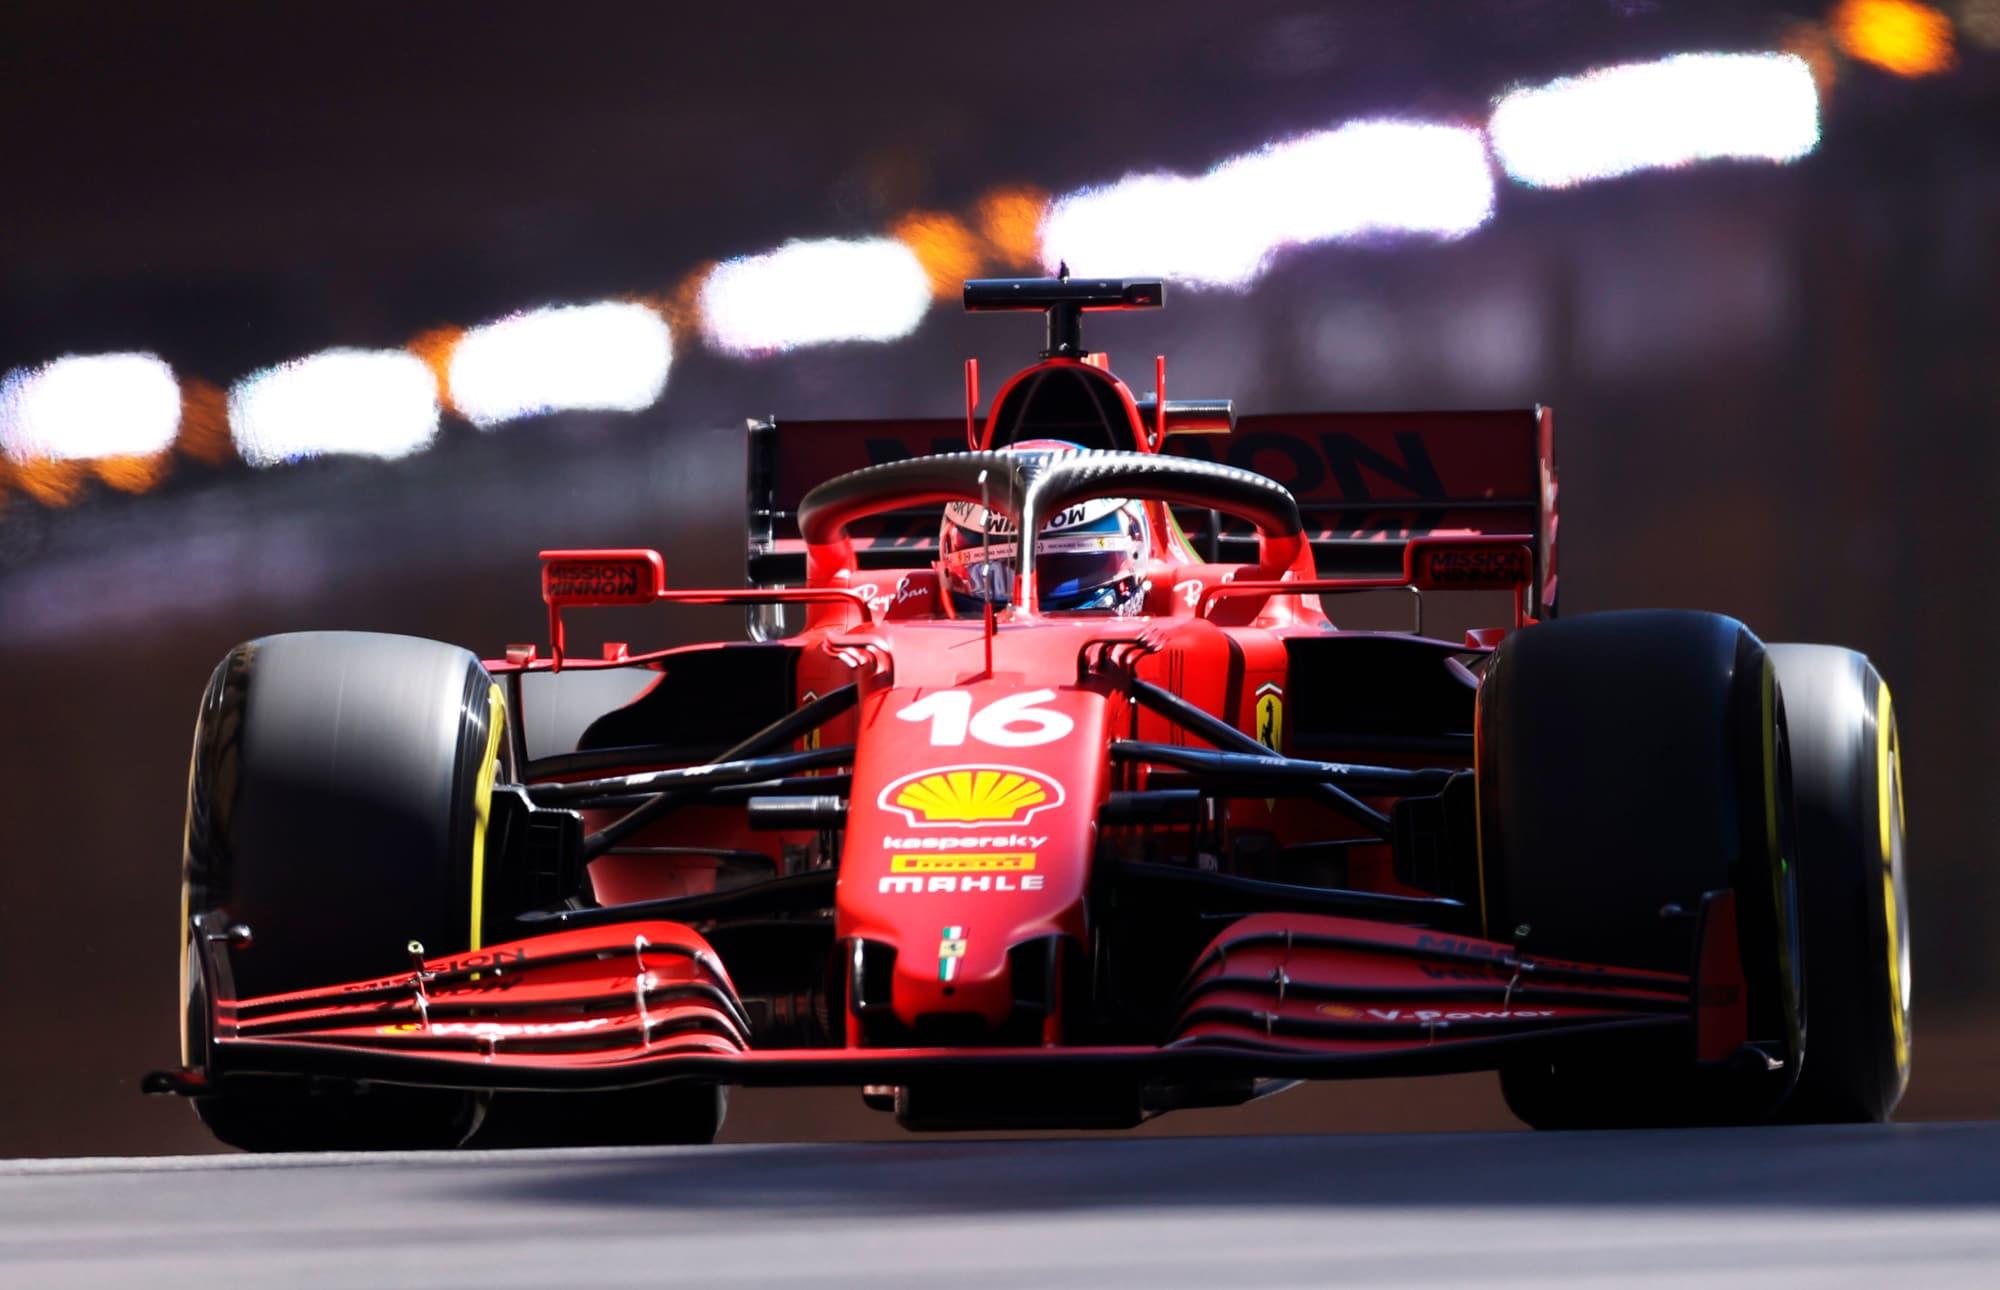 F1 Gp Monaco, diretta gara: dove vederla in tv